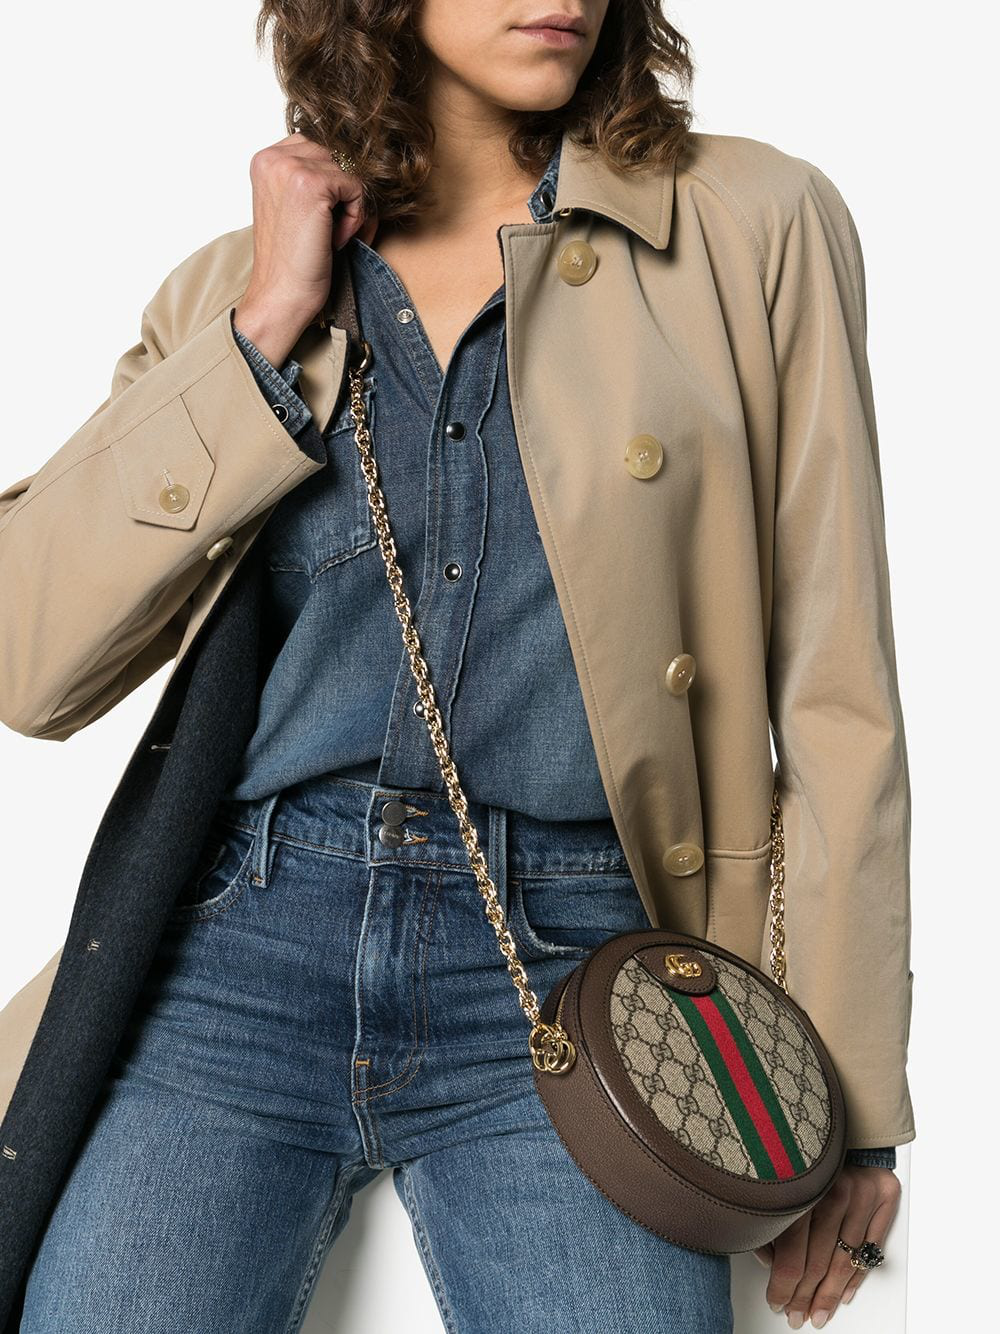 0aeda5f44e05bb Gucci Ophidia Mini Gg Round Shoulder Bag In Neutrals | ModeSens